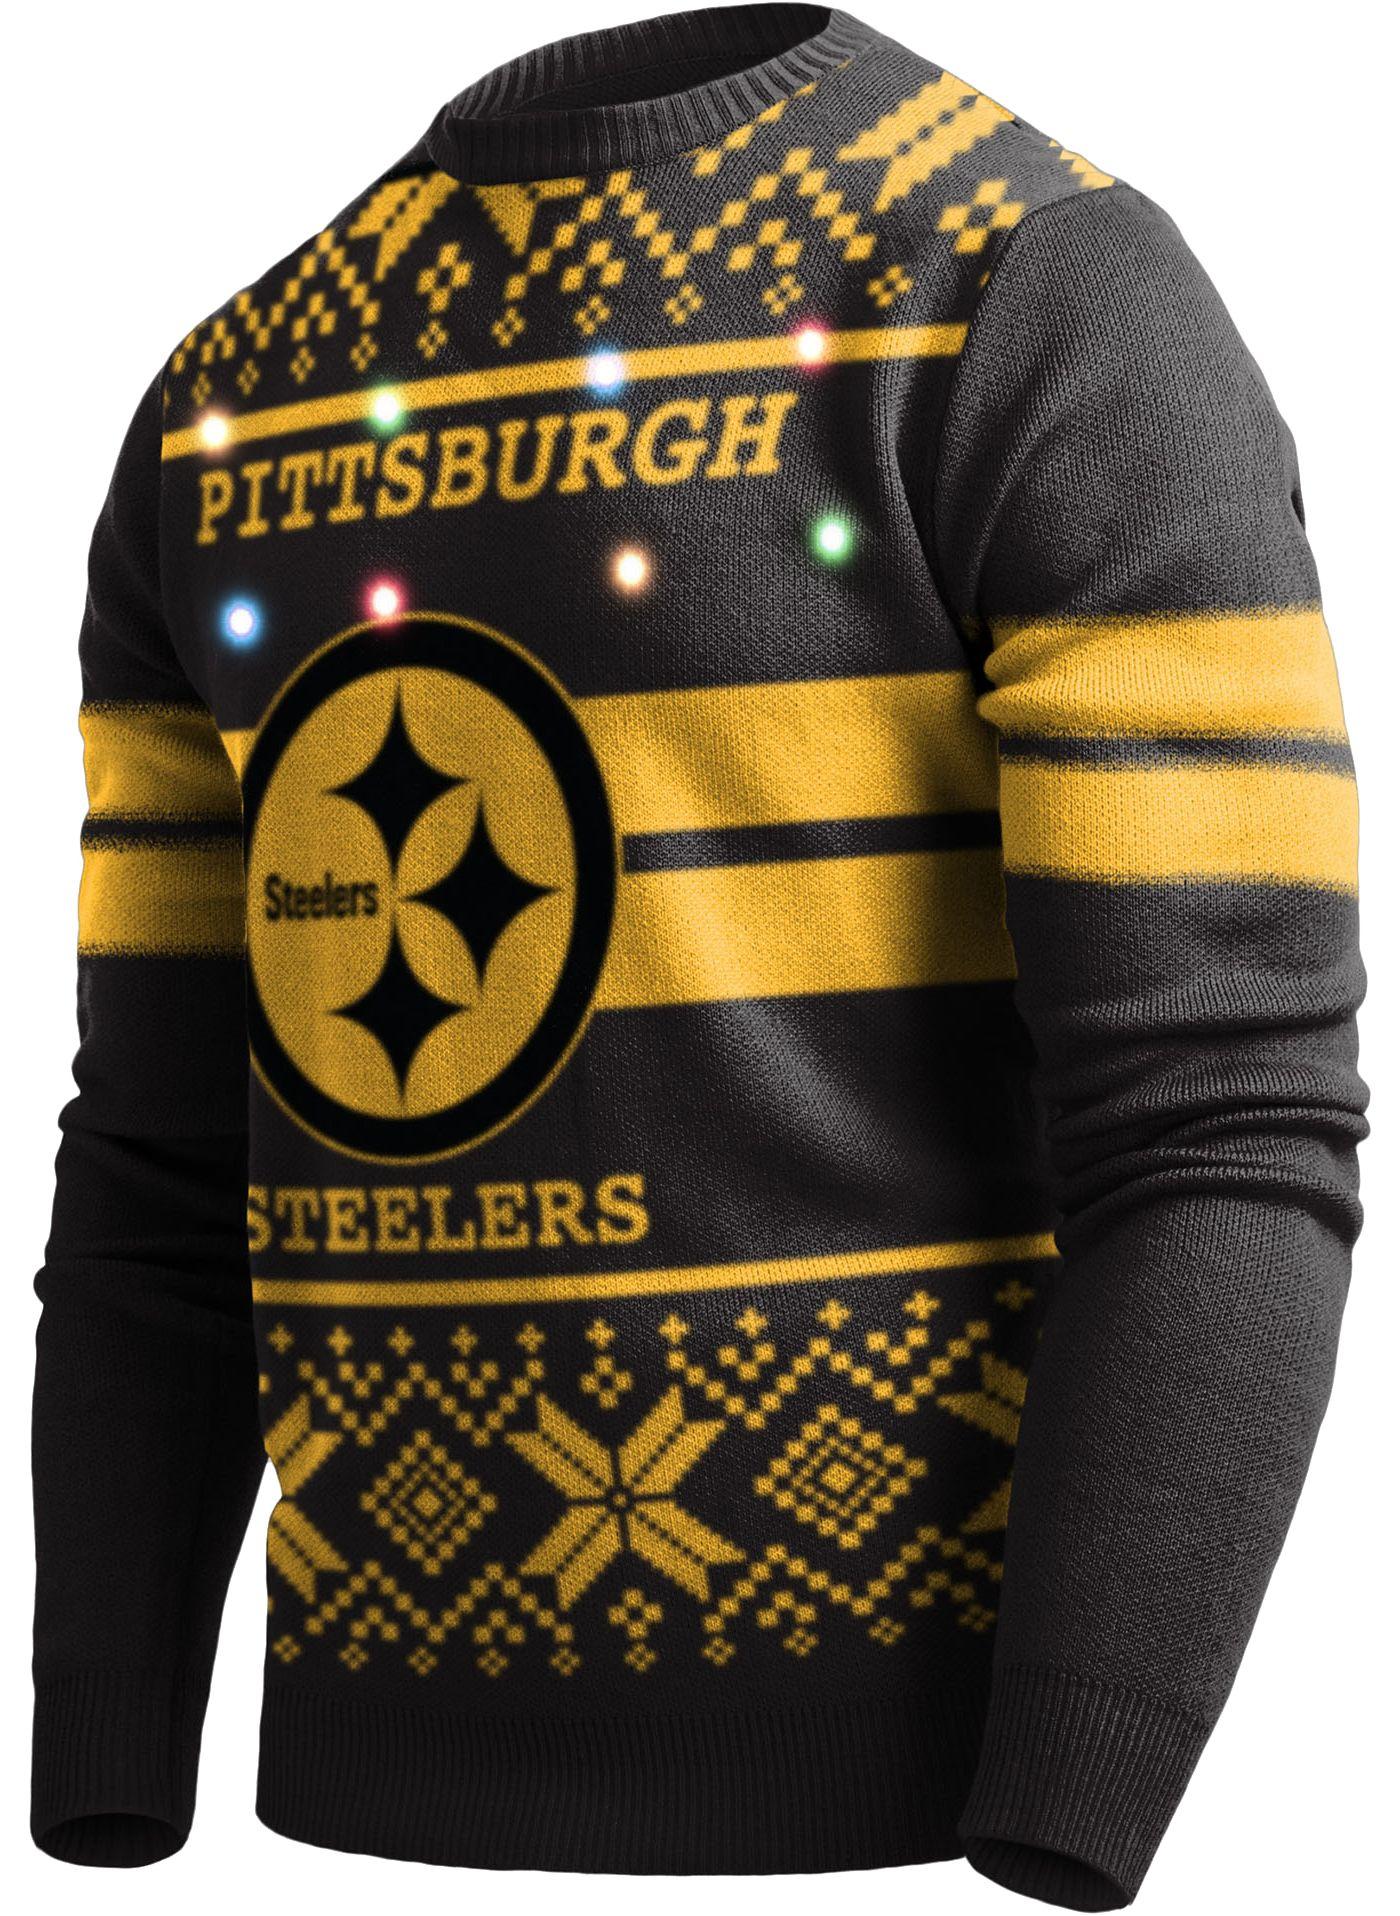 FOCO Men's Pittsburgh Steelers Logo Stripe Light Up Black Ugly Sweater